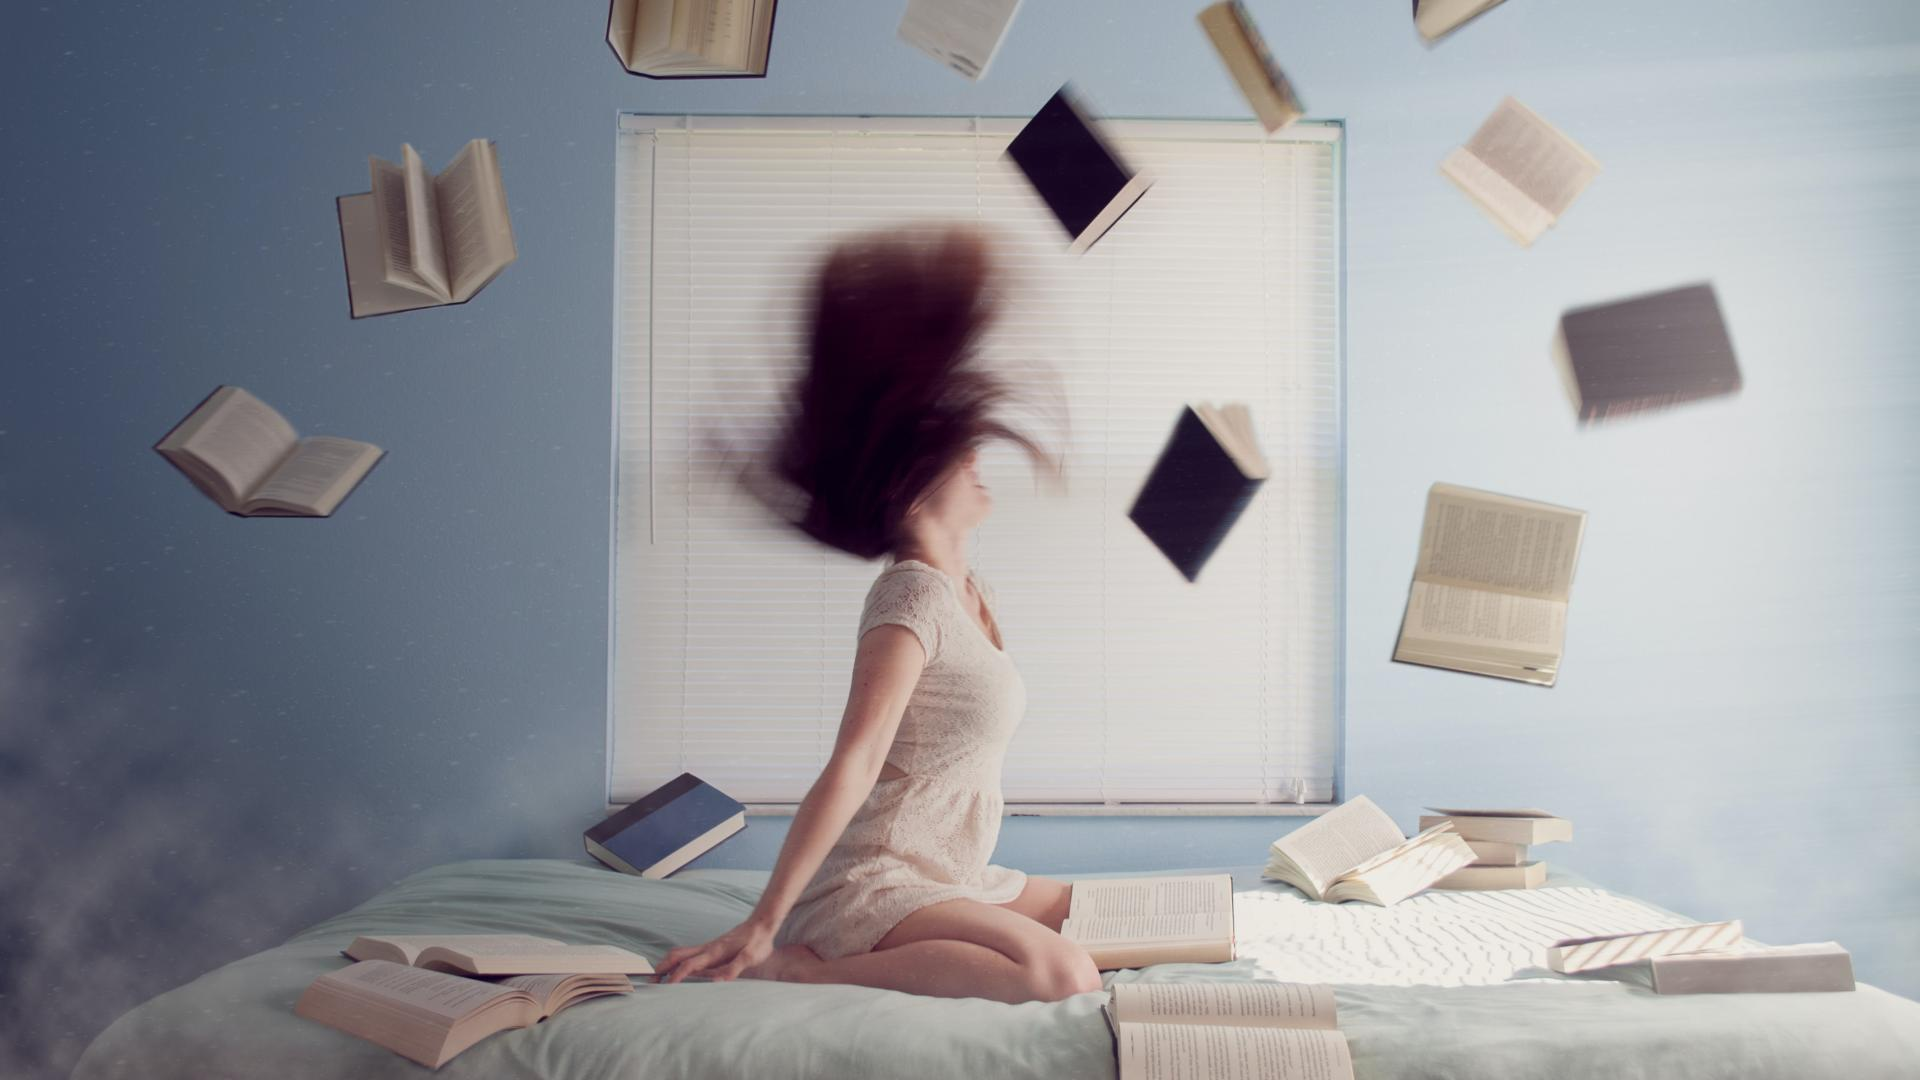 Frau Bücher stress lernen